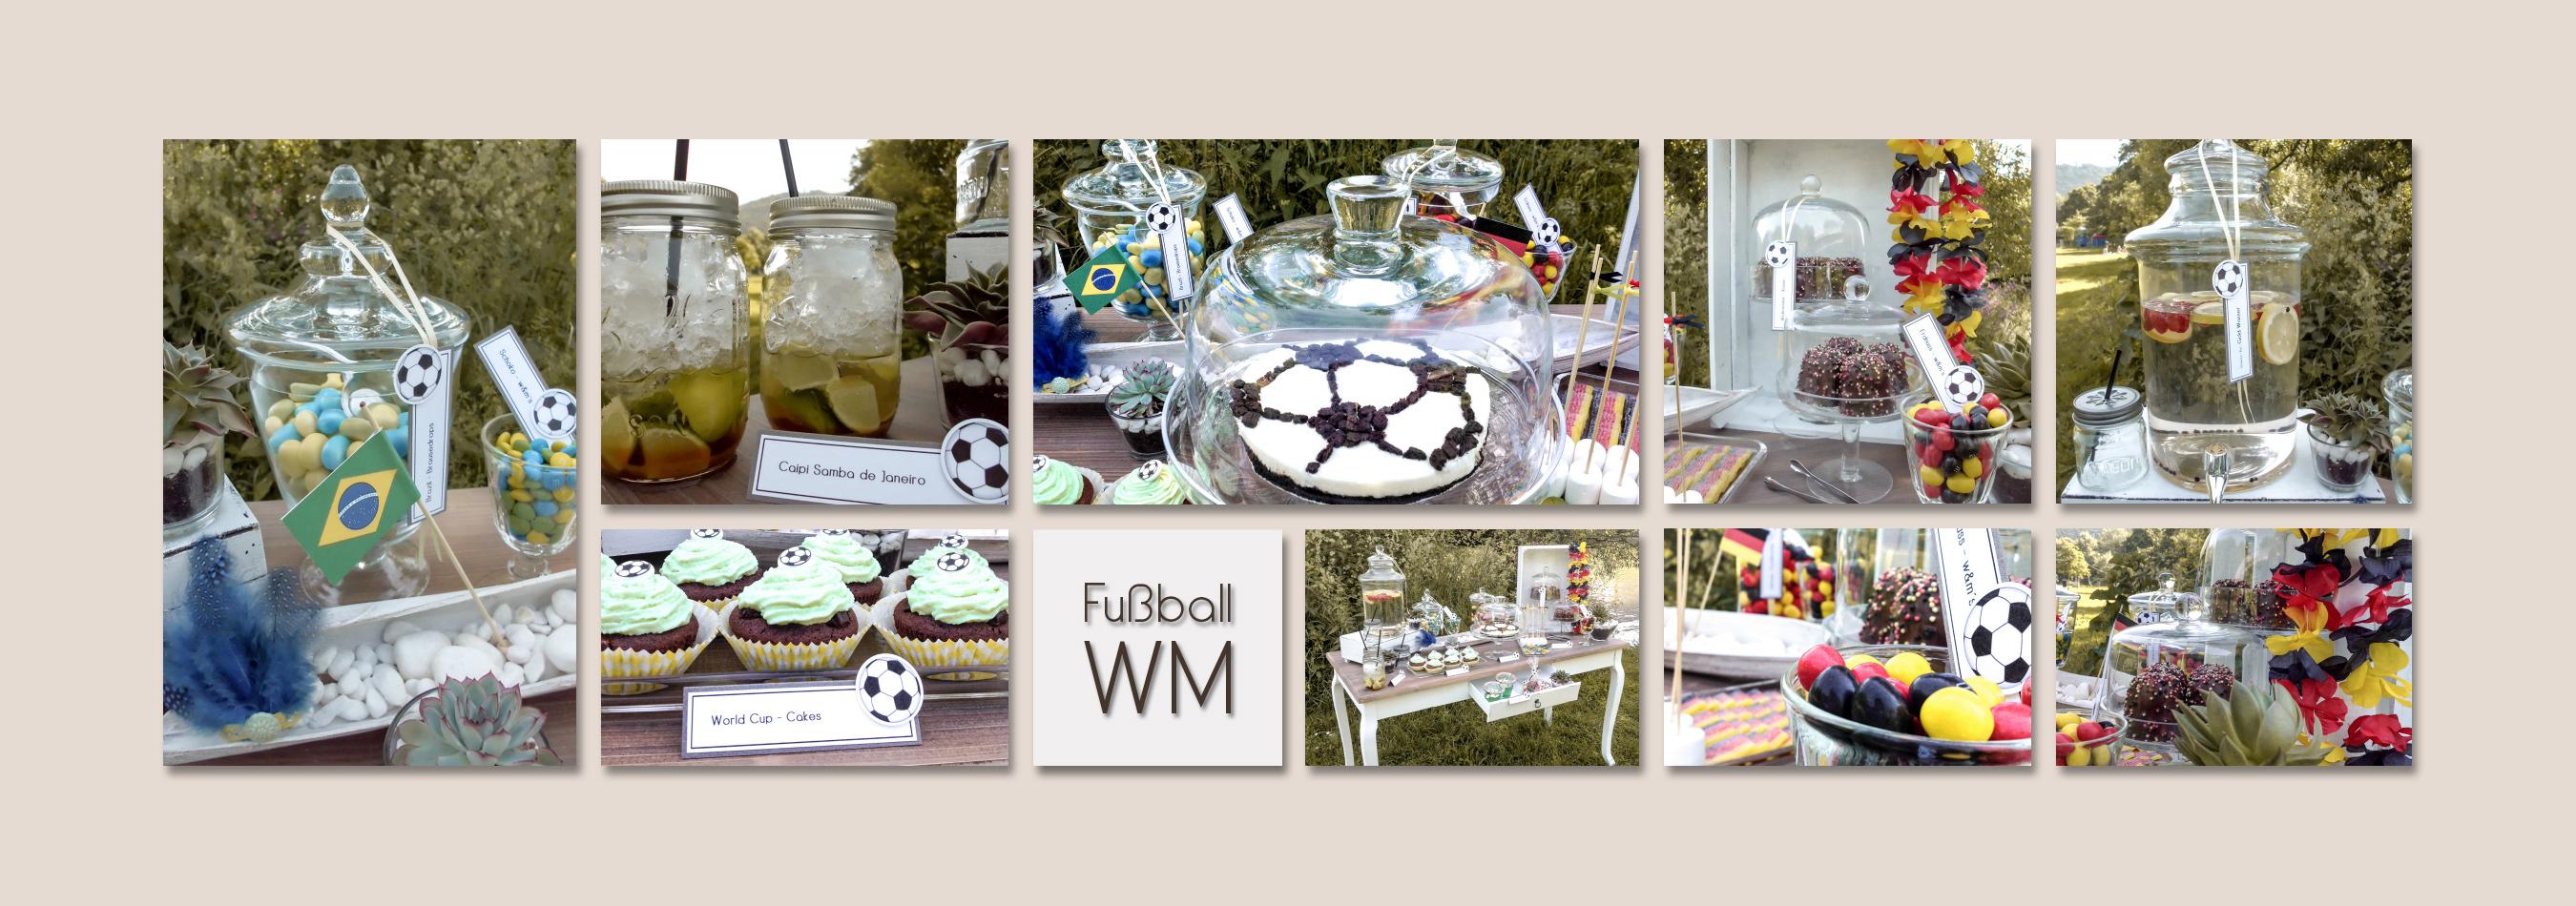 05_Fussball-WM.jpg